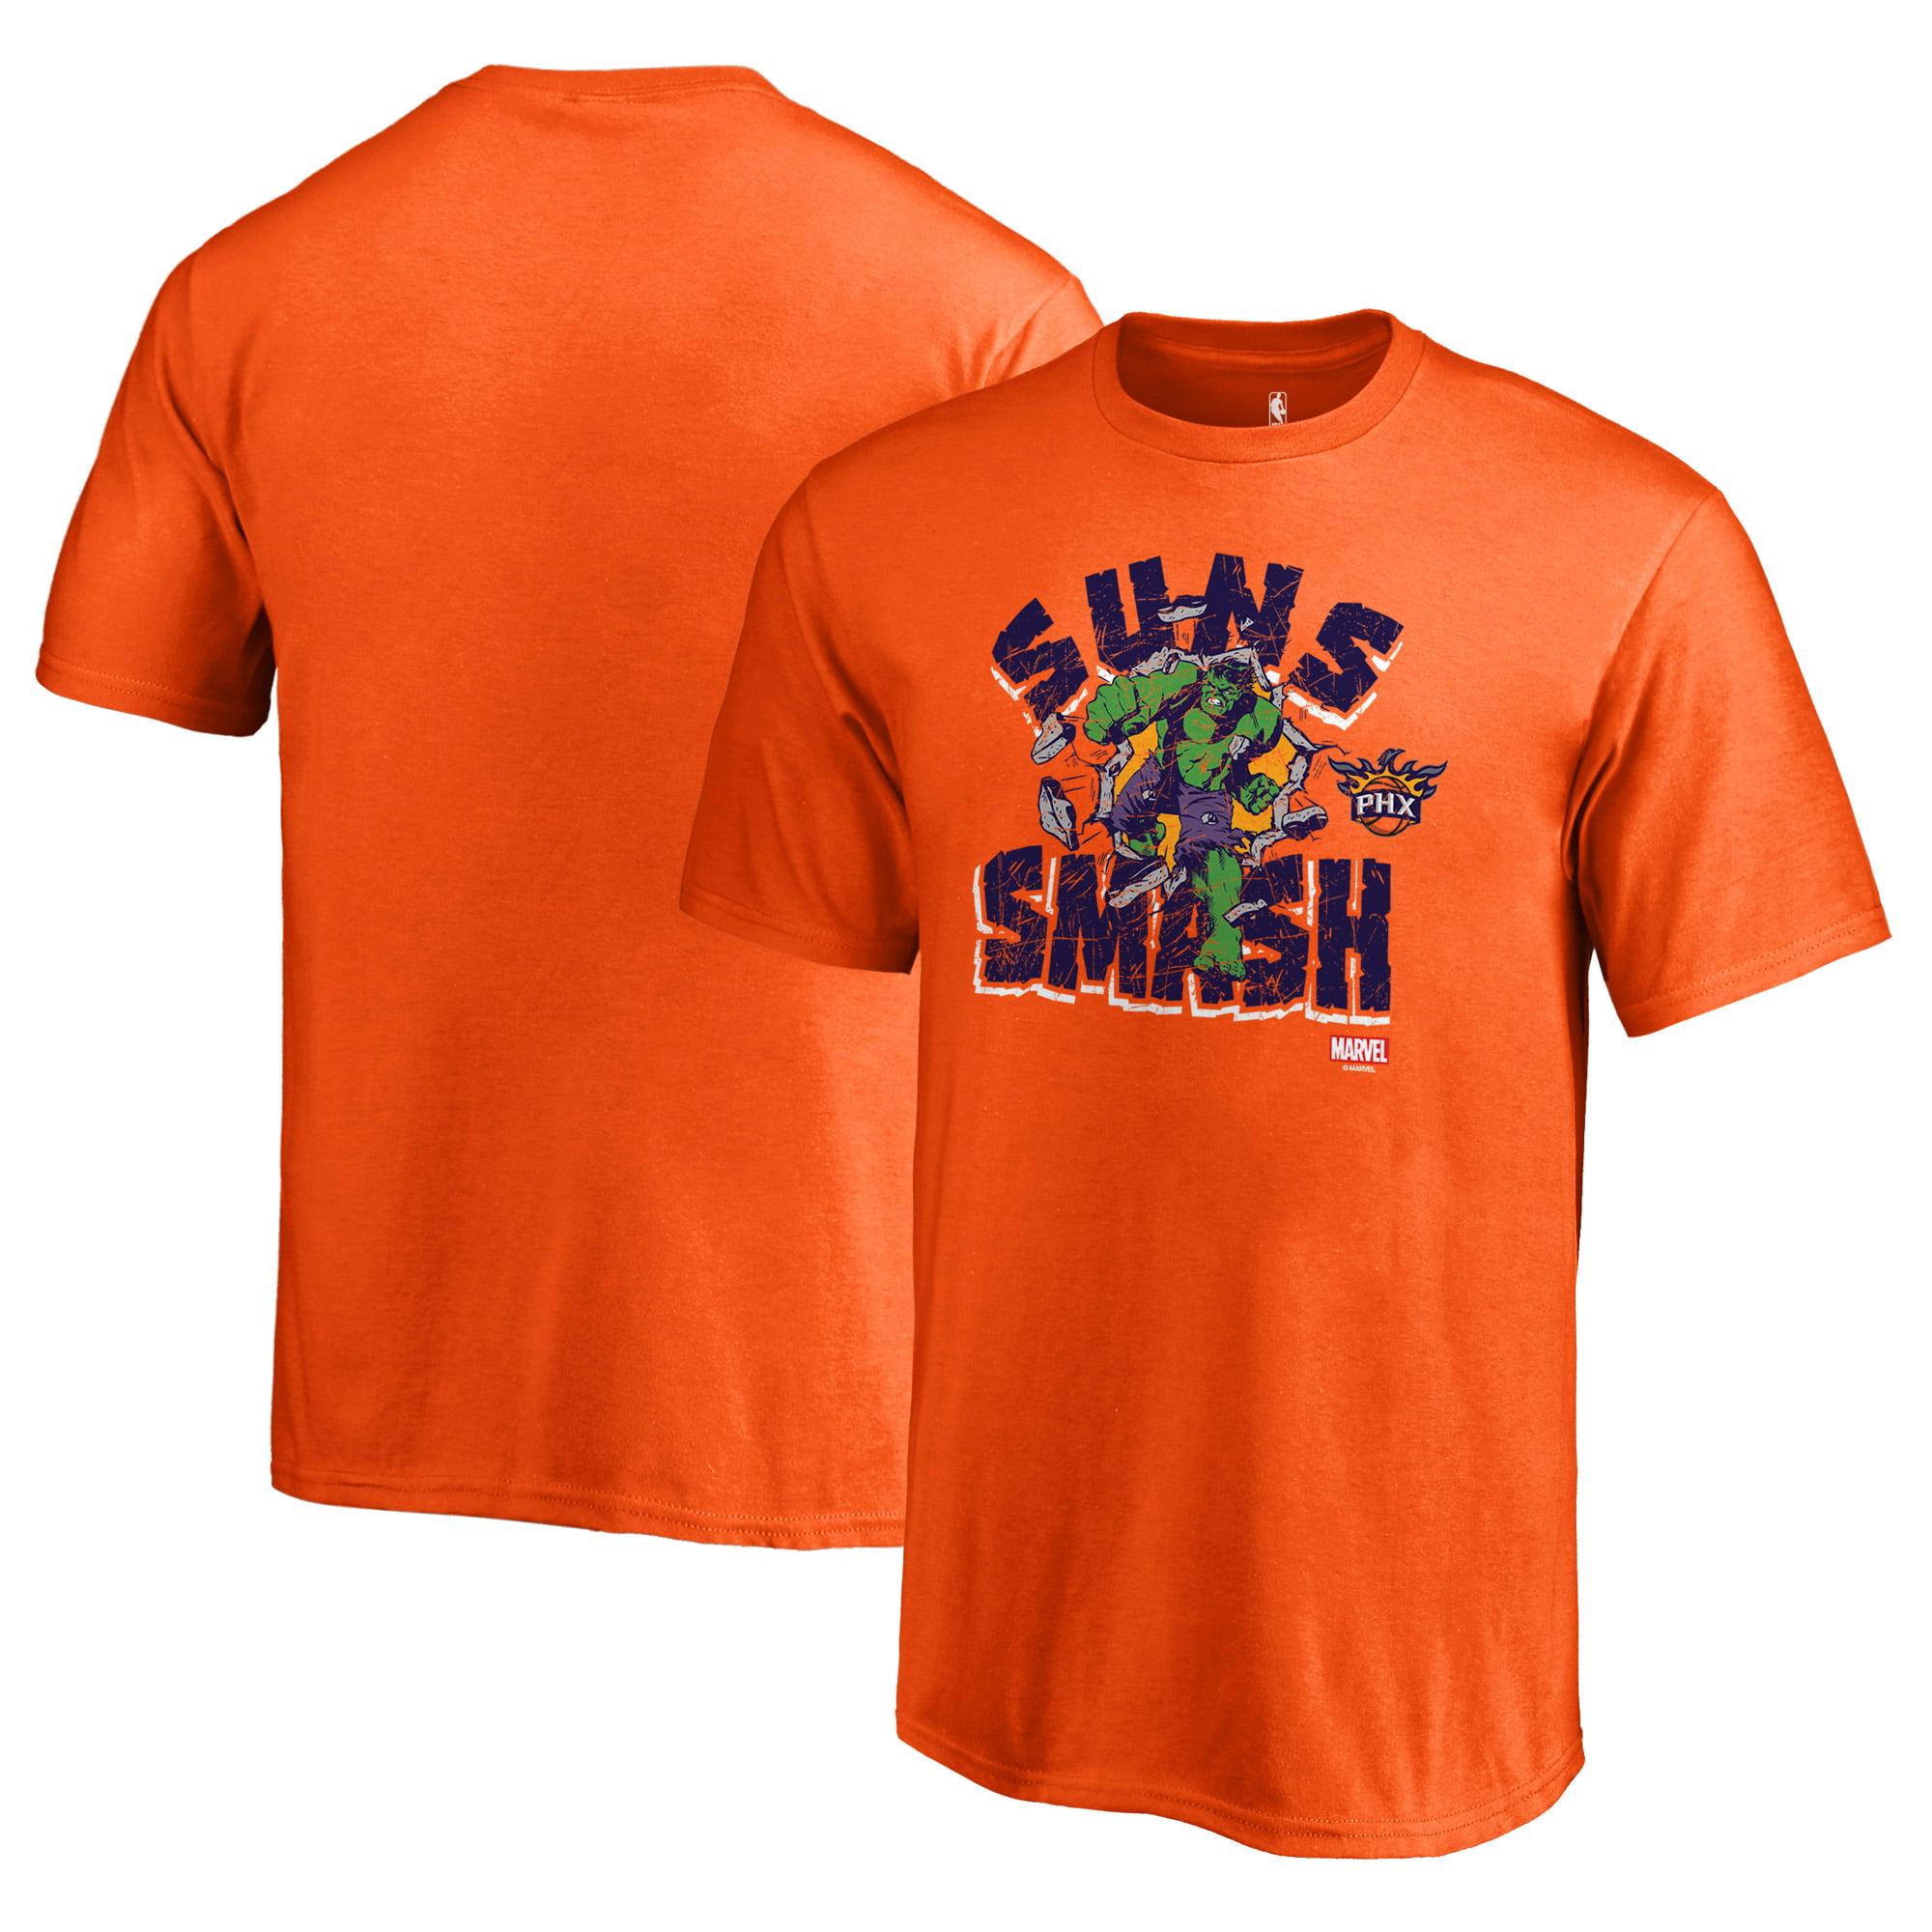 Phoenix Suns Fanatics Branded Youth Marvel Hulk Smash T-Shirt - Orange